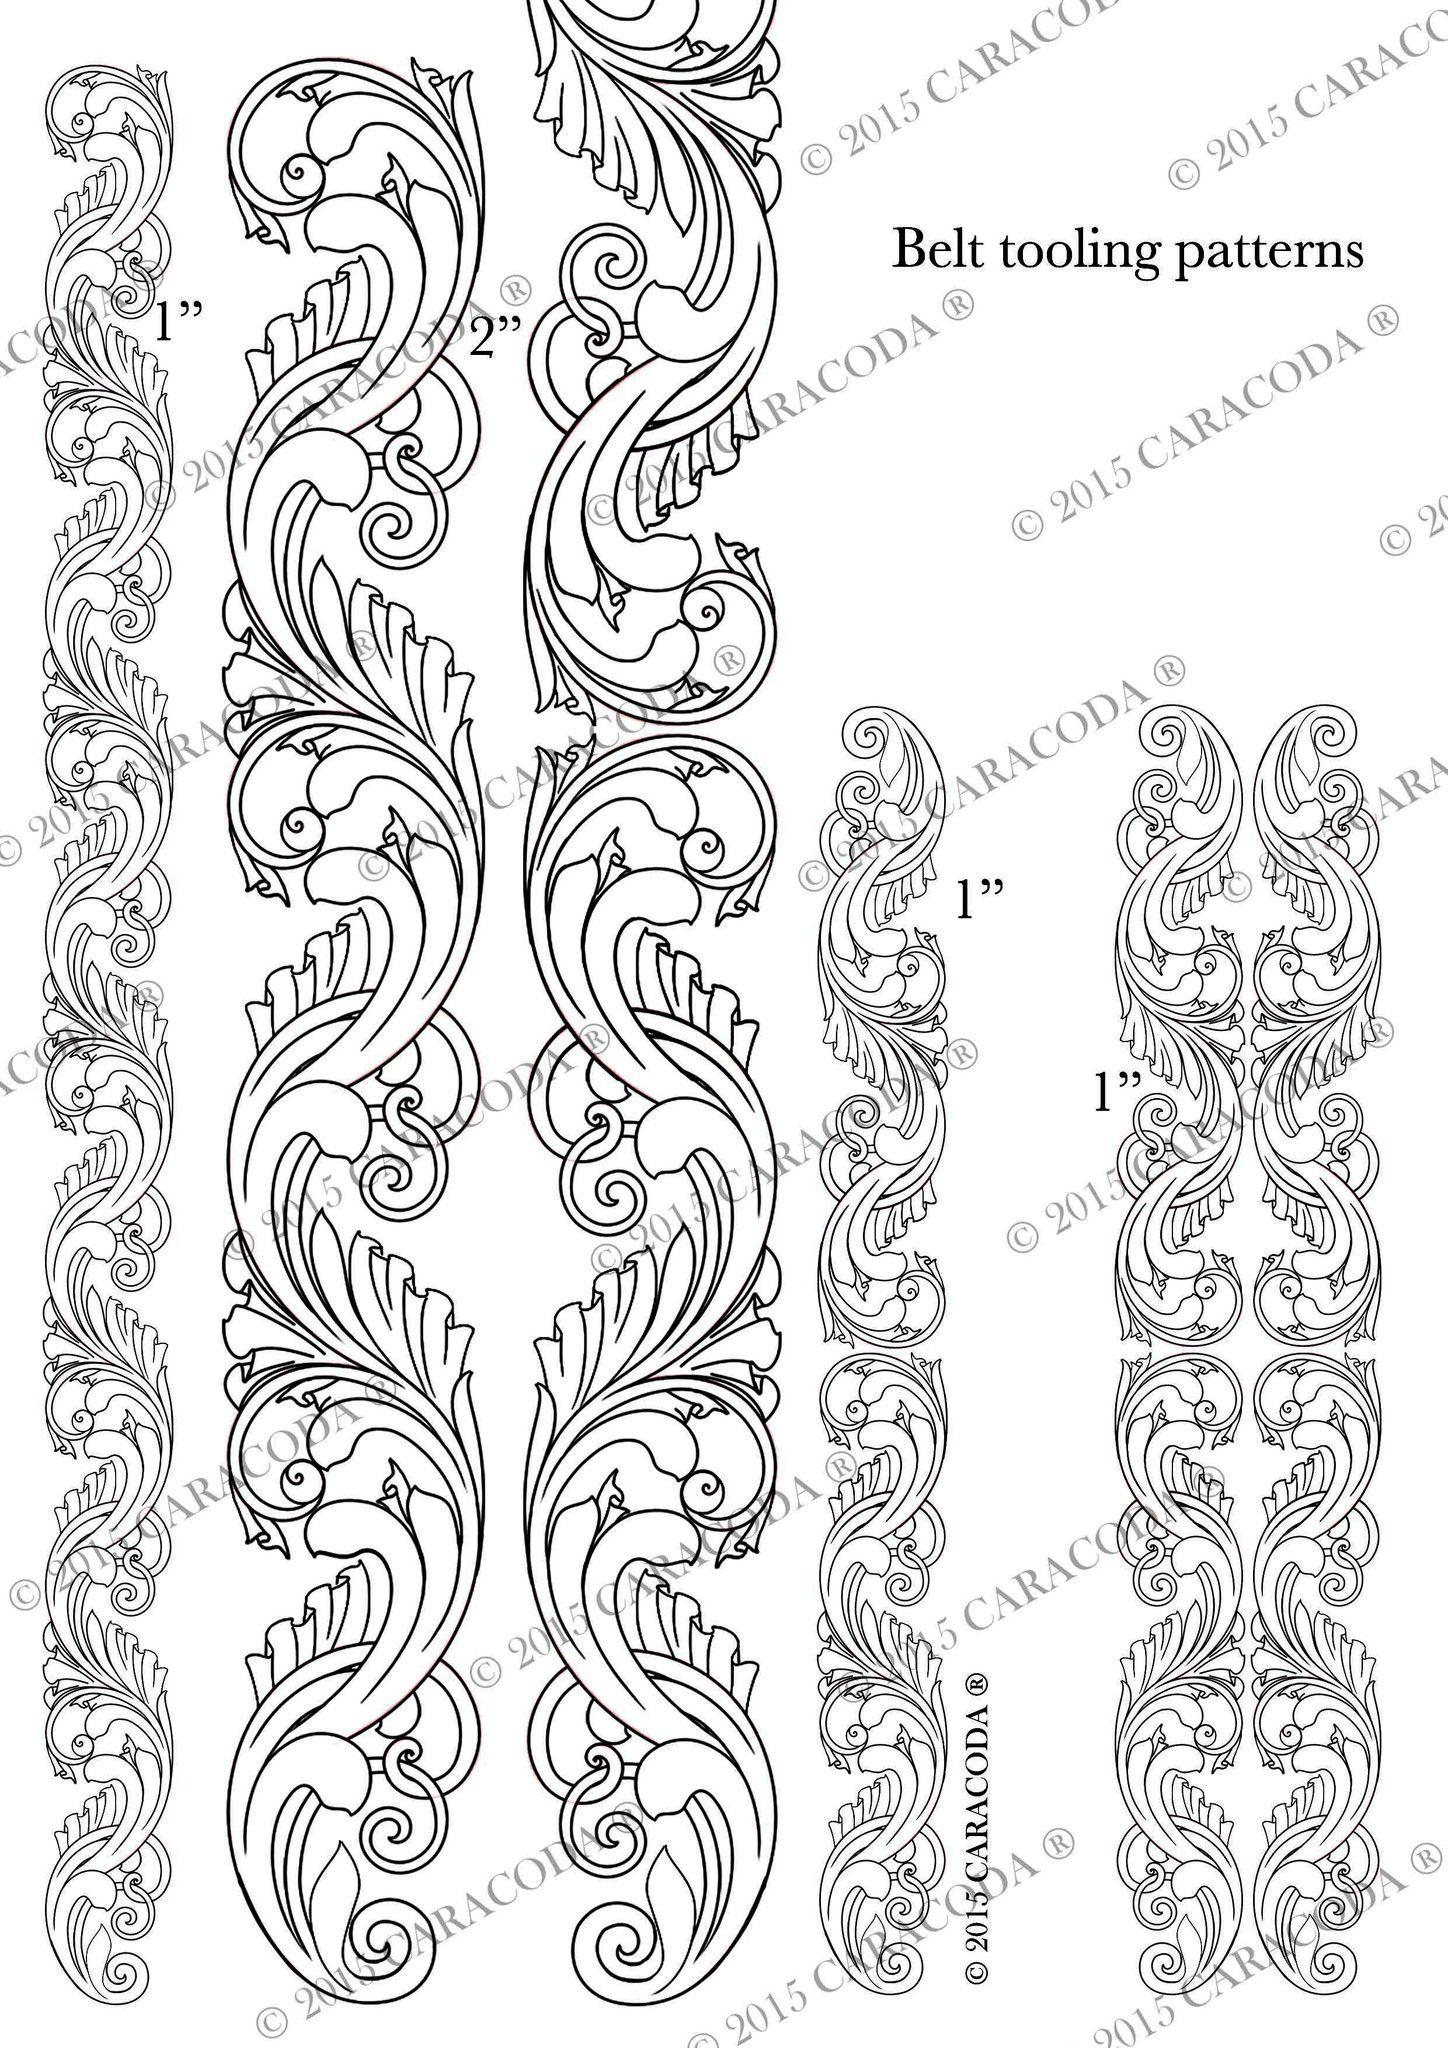 image regarding Free Printable Leather Belt Tooling Patterns titled Leathercraft tooling habit Belt A4 001 leather-based designs